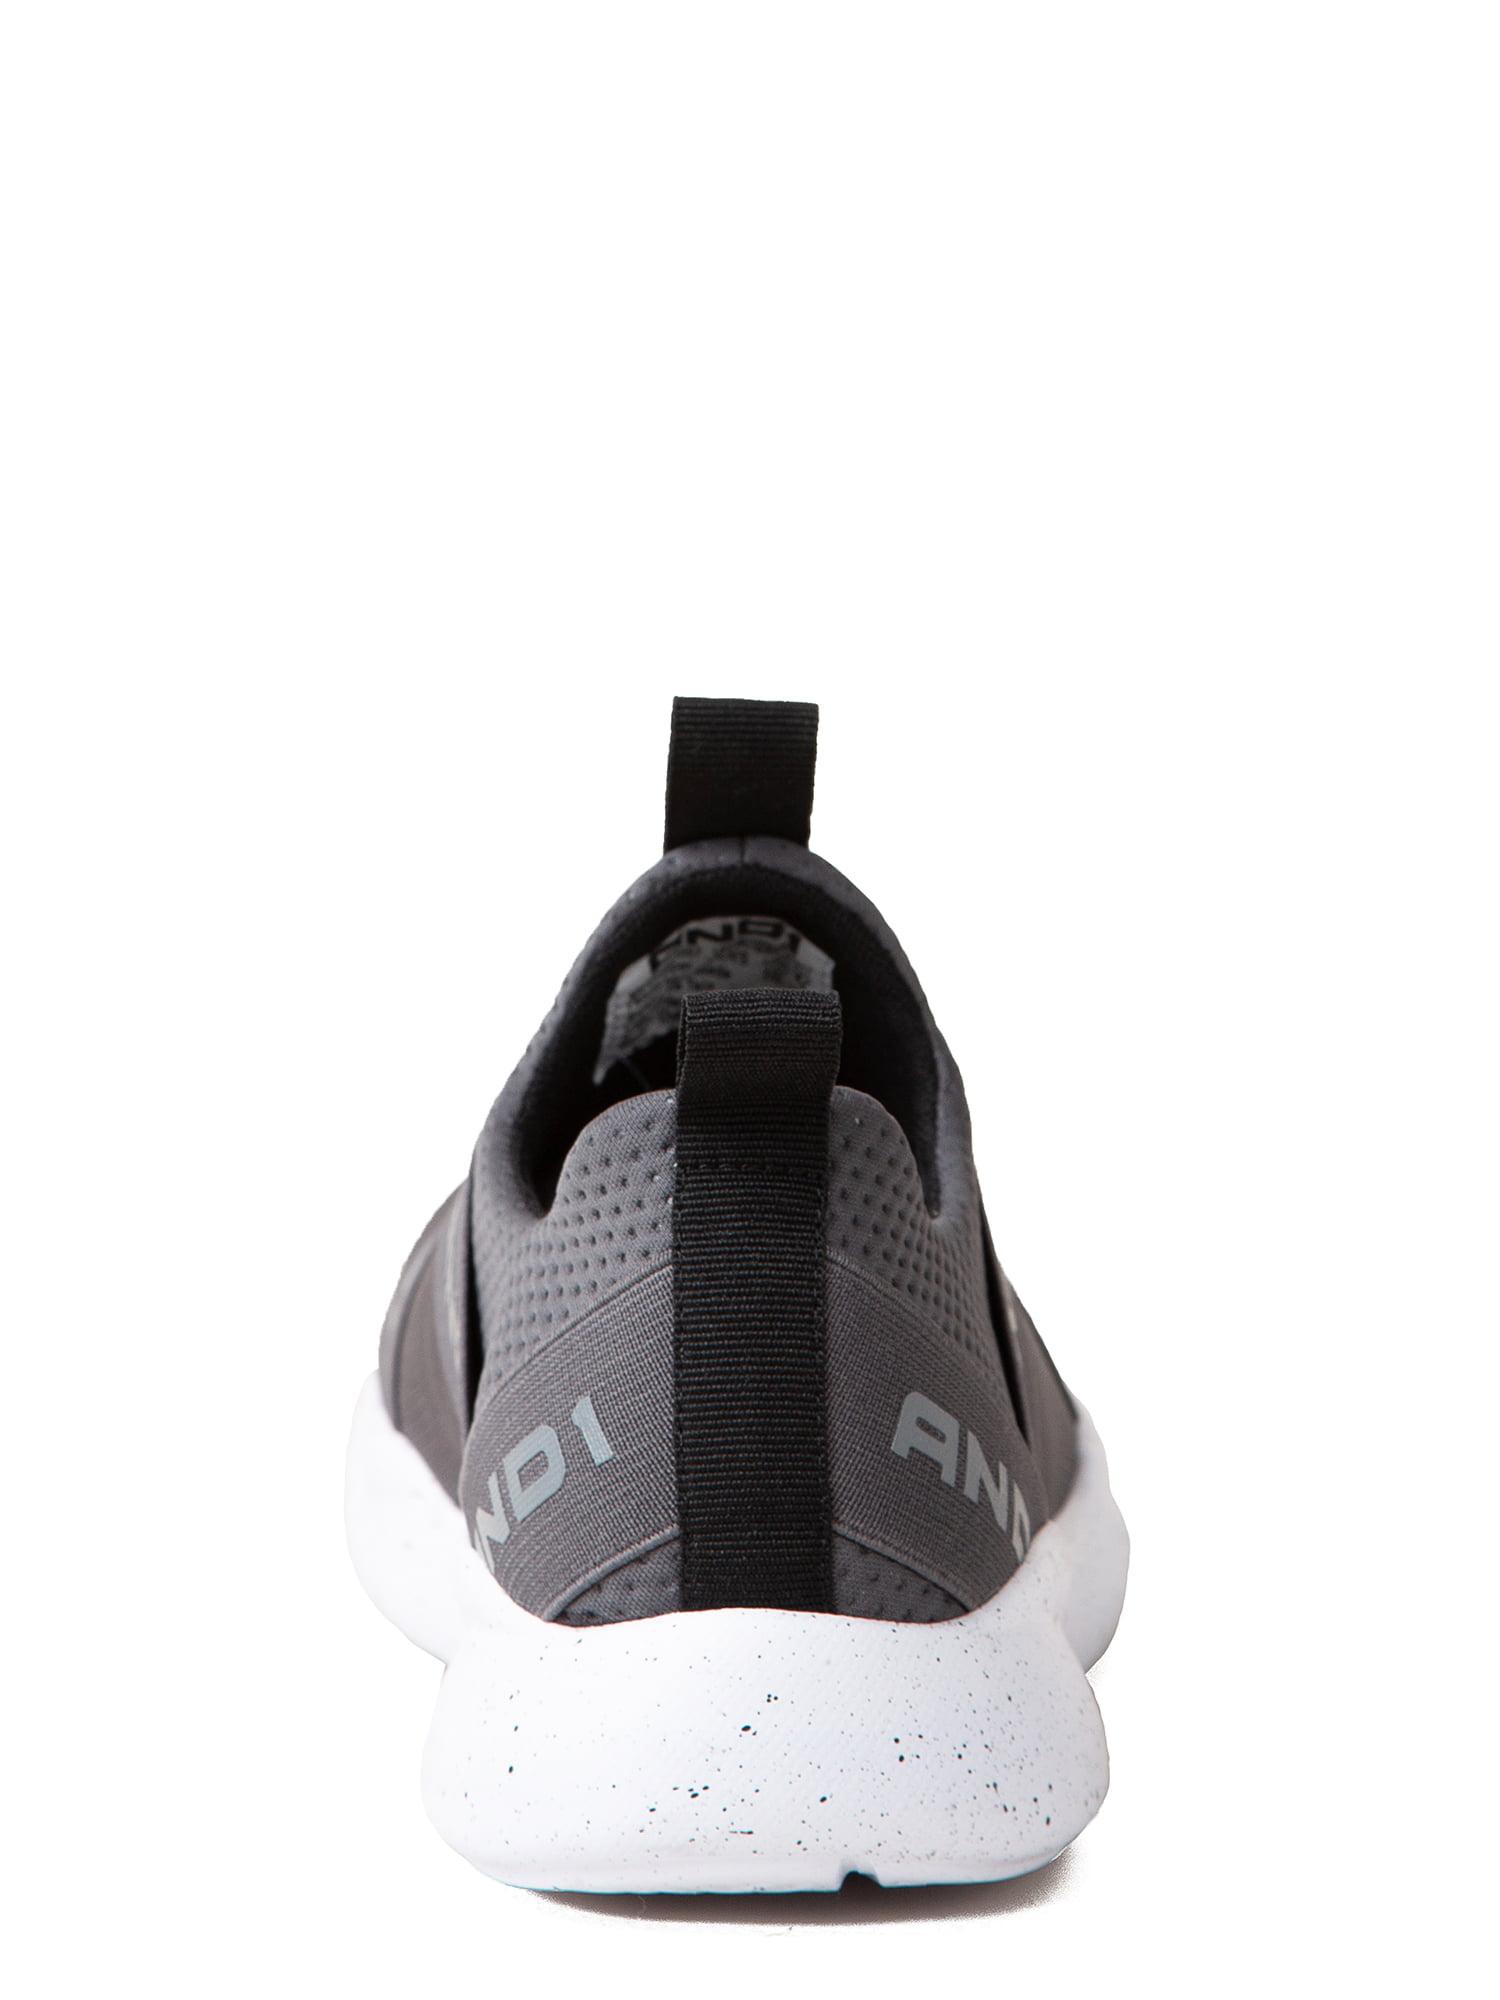 and1 men's pivot athletic shoe